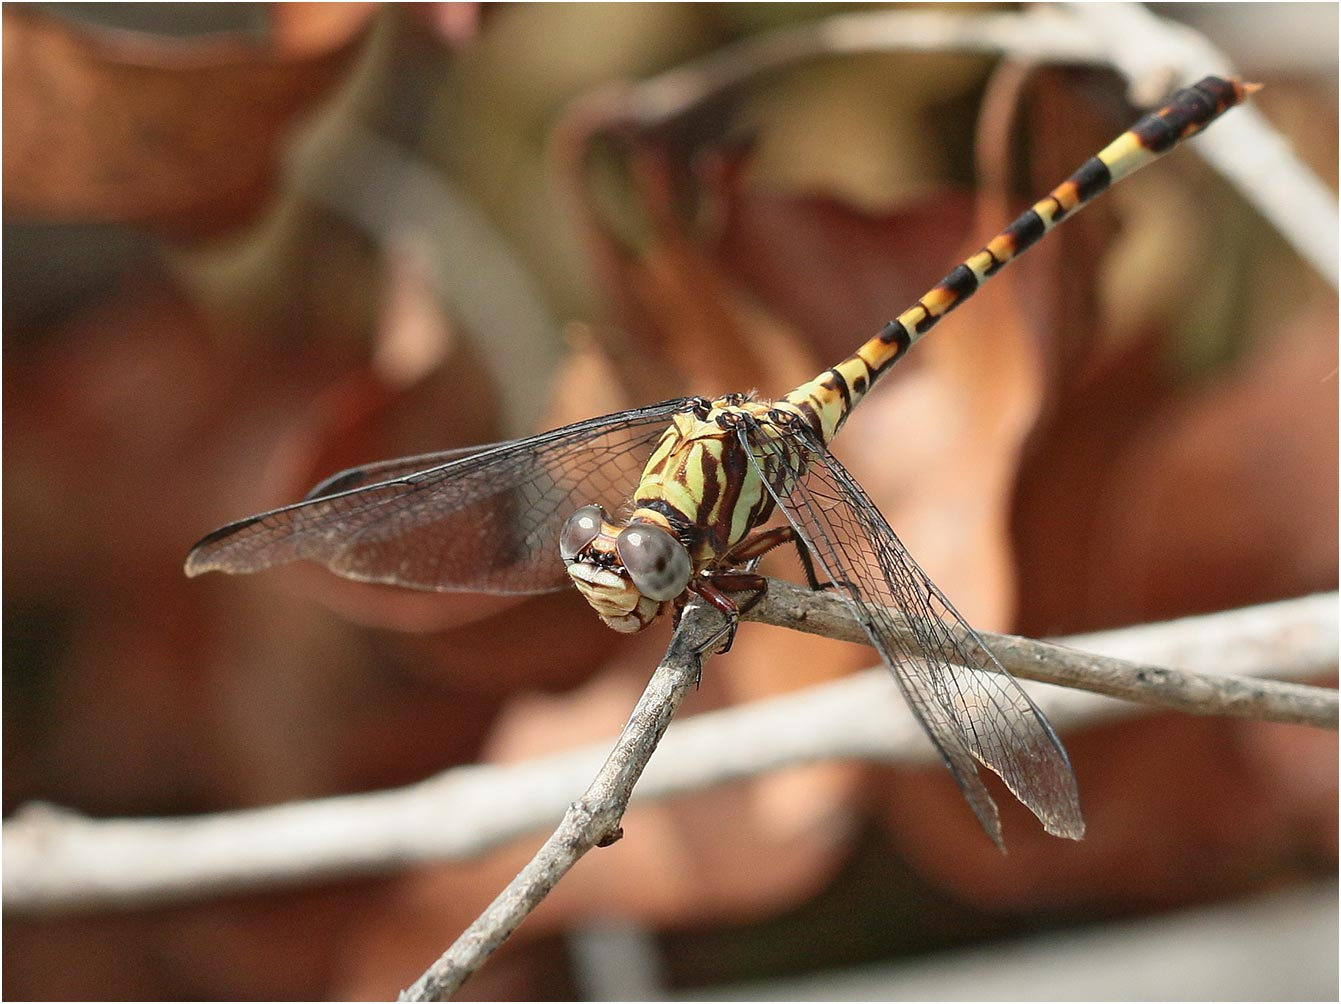 Paragomphus elpidius femelle immature, Namibie, Kalambesa, 15/02/2020